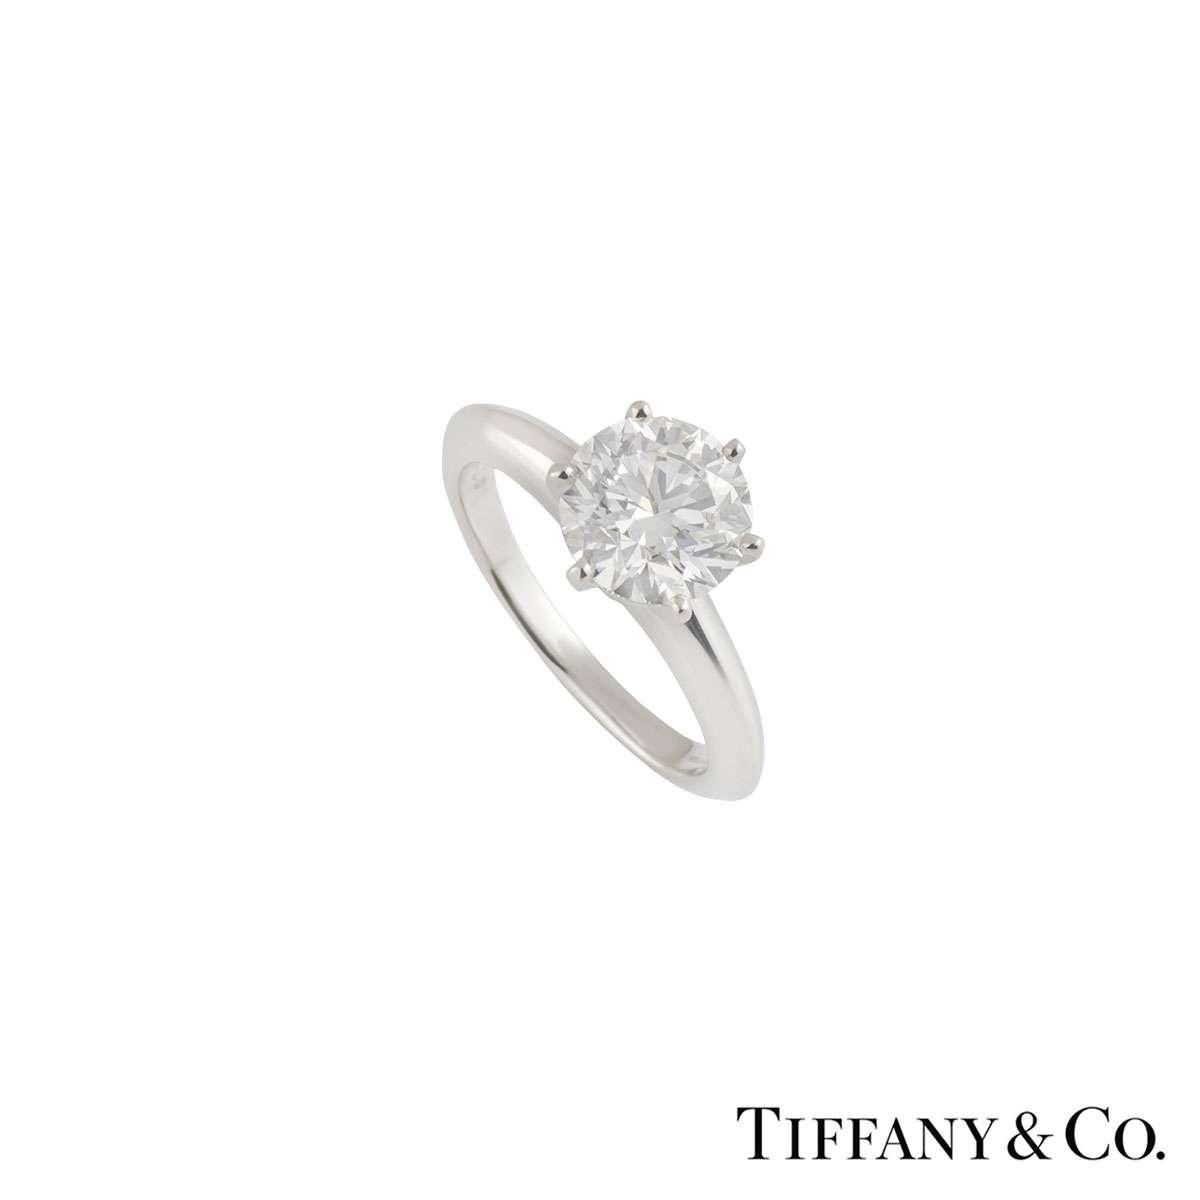 Tiffany & Co. Platinum Diamond Setting Band Ring 1.79ct F/VS1